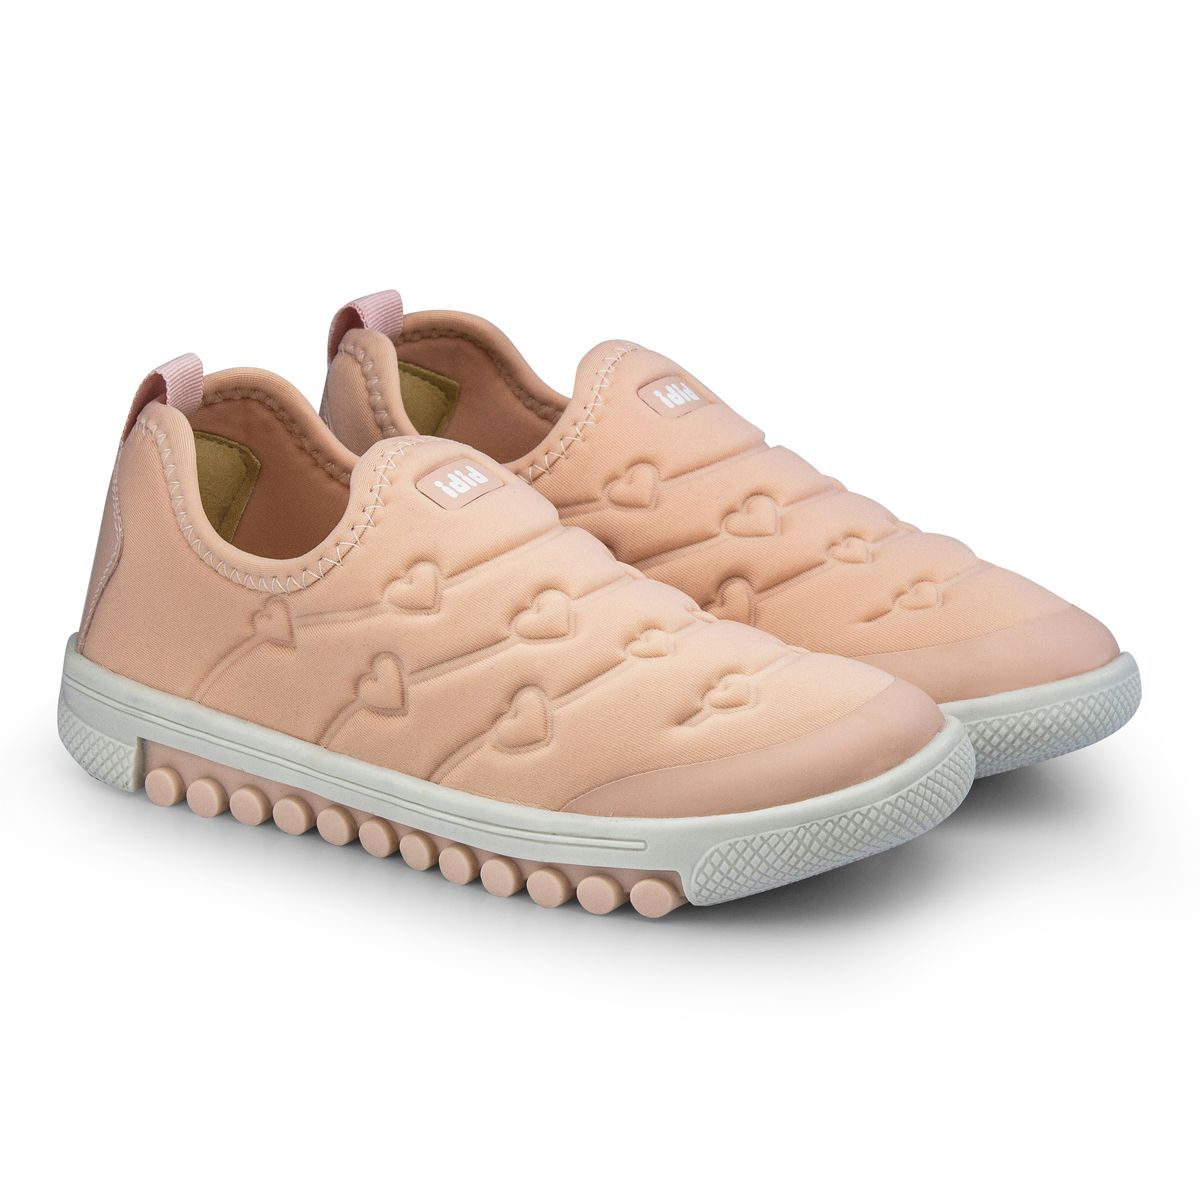 Pantofi sport Bibi Roller New Camelia, Roz